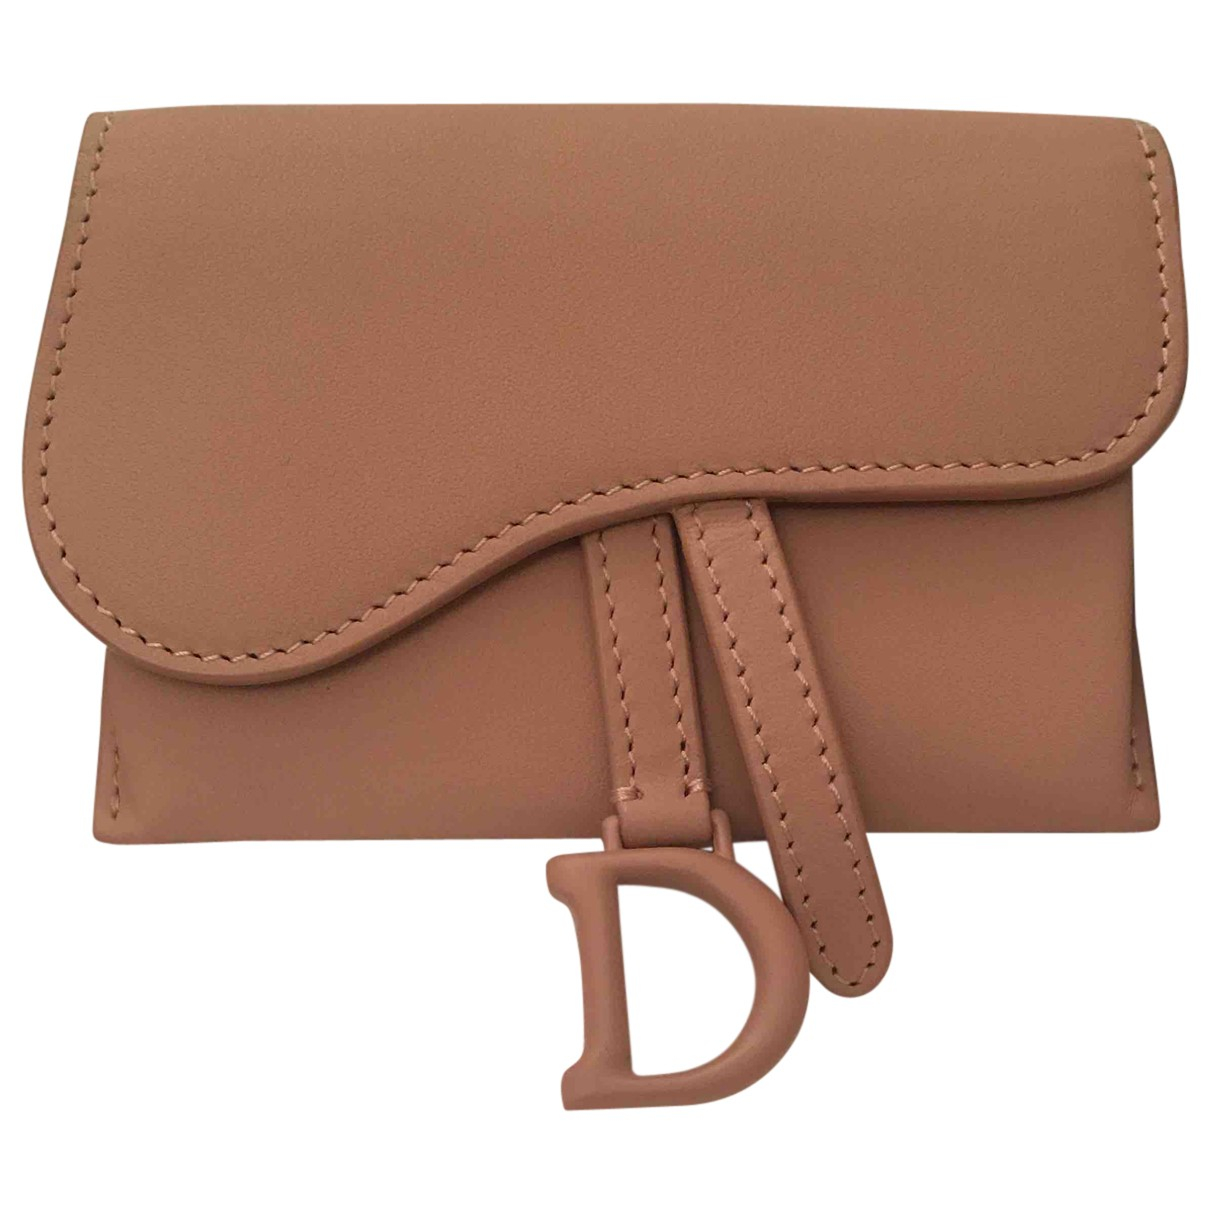 Dior - Pochette Saddle pour femme en cuir - rose